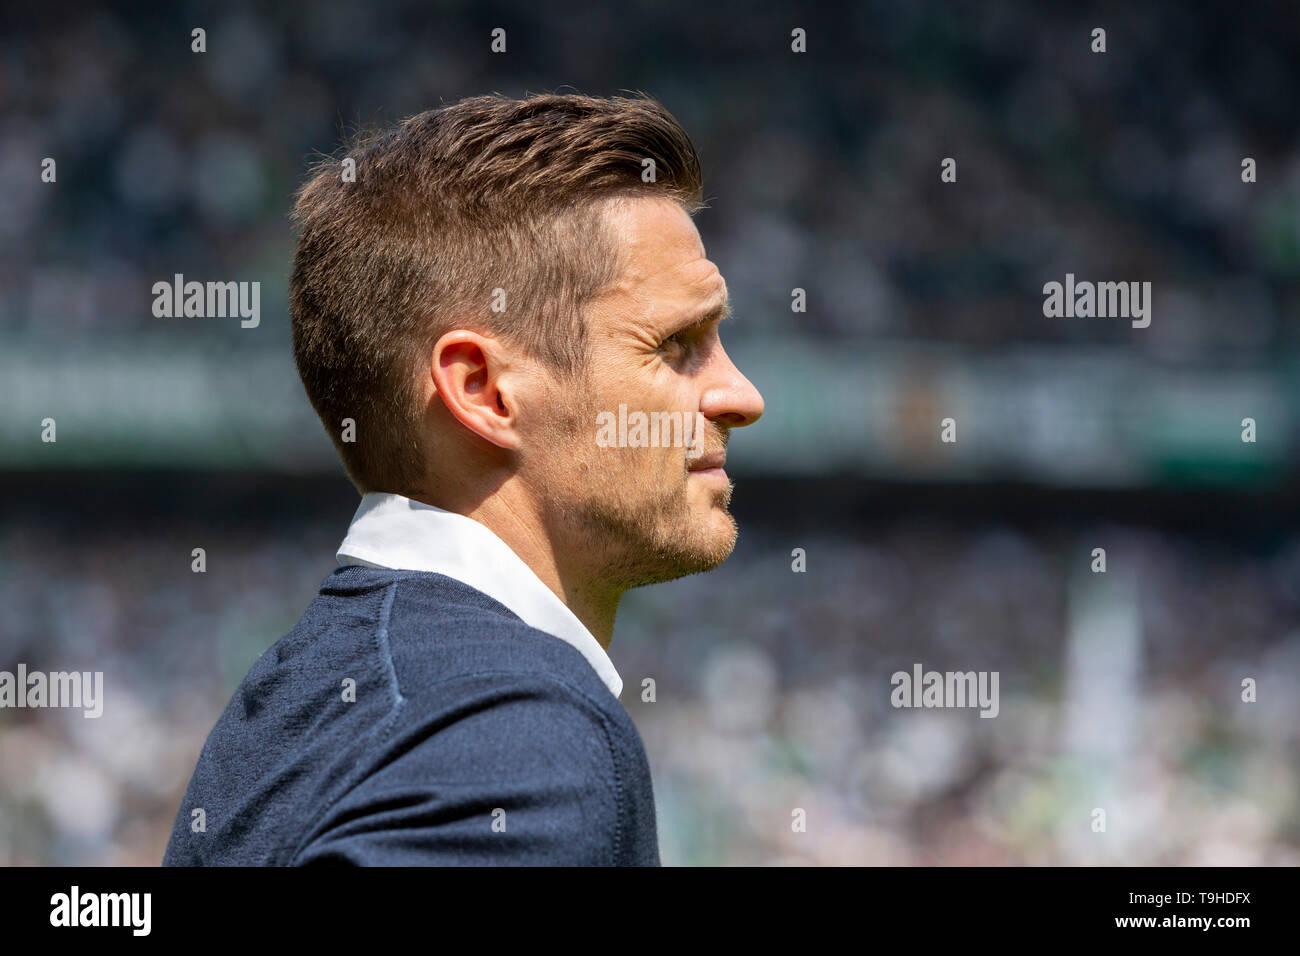 Sport, Fussball, Bundesliga, 2018/2019, Borussia Moenchengladbach vs. BVB Borussia Dortmund 0-2, Stadion Borussia-Park, Sebastian Kehl (BVB), Leiter Lizenzspielerabteilung, Teammanager, DFL REGULATIONS PROHIBIT ANY USE OF PHOTOGRAPHS AS IMAGE SEQUENCES AND/OR QUASI-VIDEO, sports, football, Bundesliga, 2018/2019, Borussia Moenchengladbach vs. BVB Borussia Dortmund 0-2, Stadium Borussia Park, Sebastian Kehl (BVB), team manager, (BVB), DFL REGULATIONS PROHIBIT ANY USE OF PHOTOGRAPHS AS IMAGE SEQUENCES AND/OR QUASI-VIDEO *** Local Caption *** sports, football, Bundesliga, 2018/2019, Borussia Moenc - Stock Image